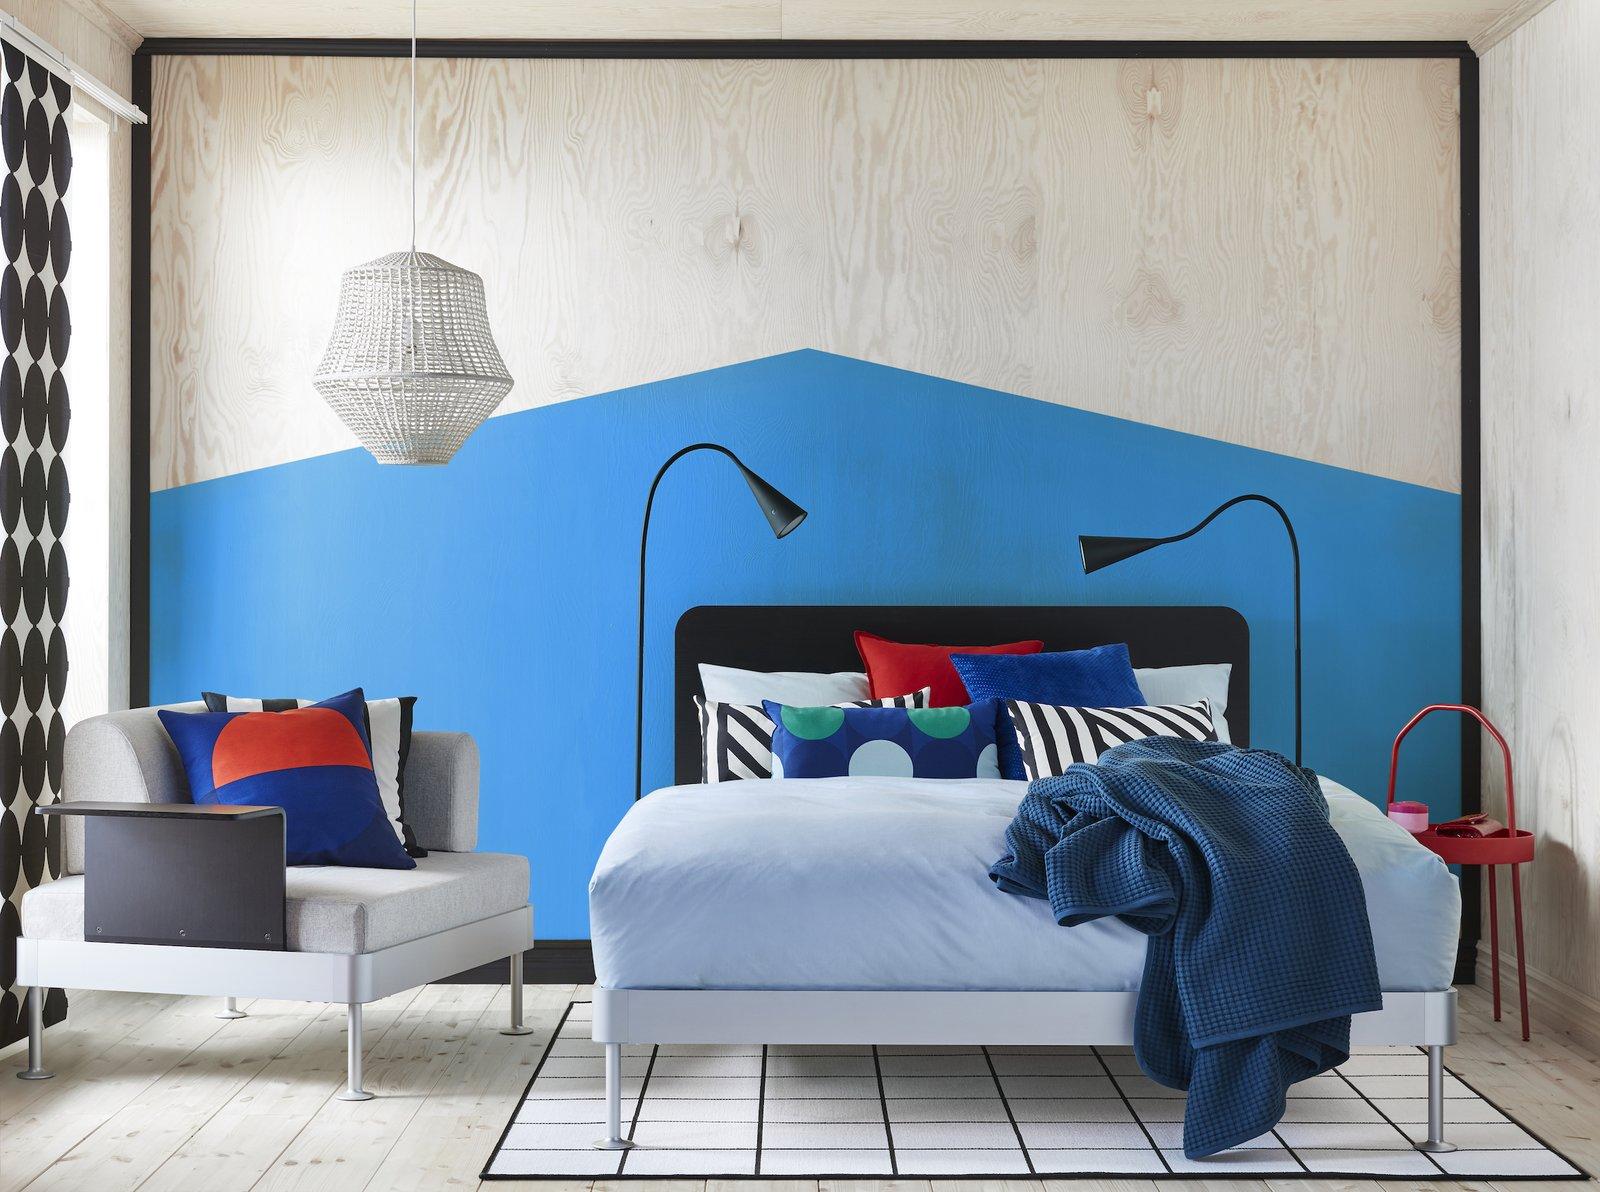 IKEA Delaktig Bed